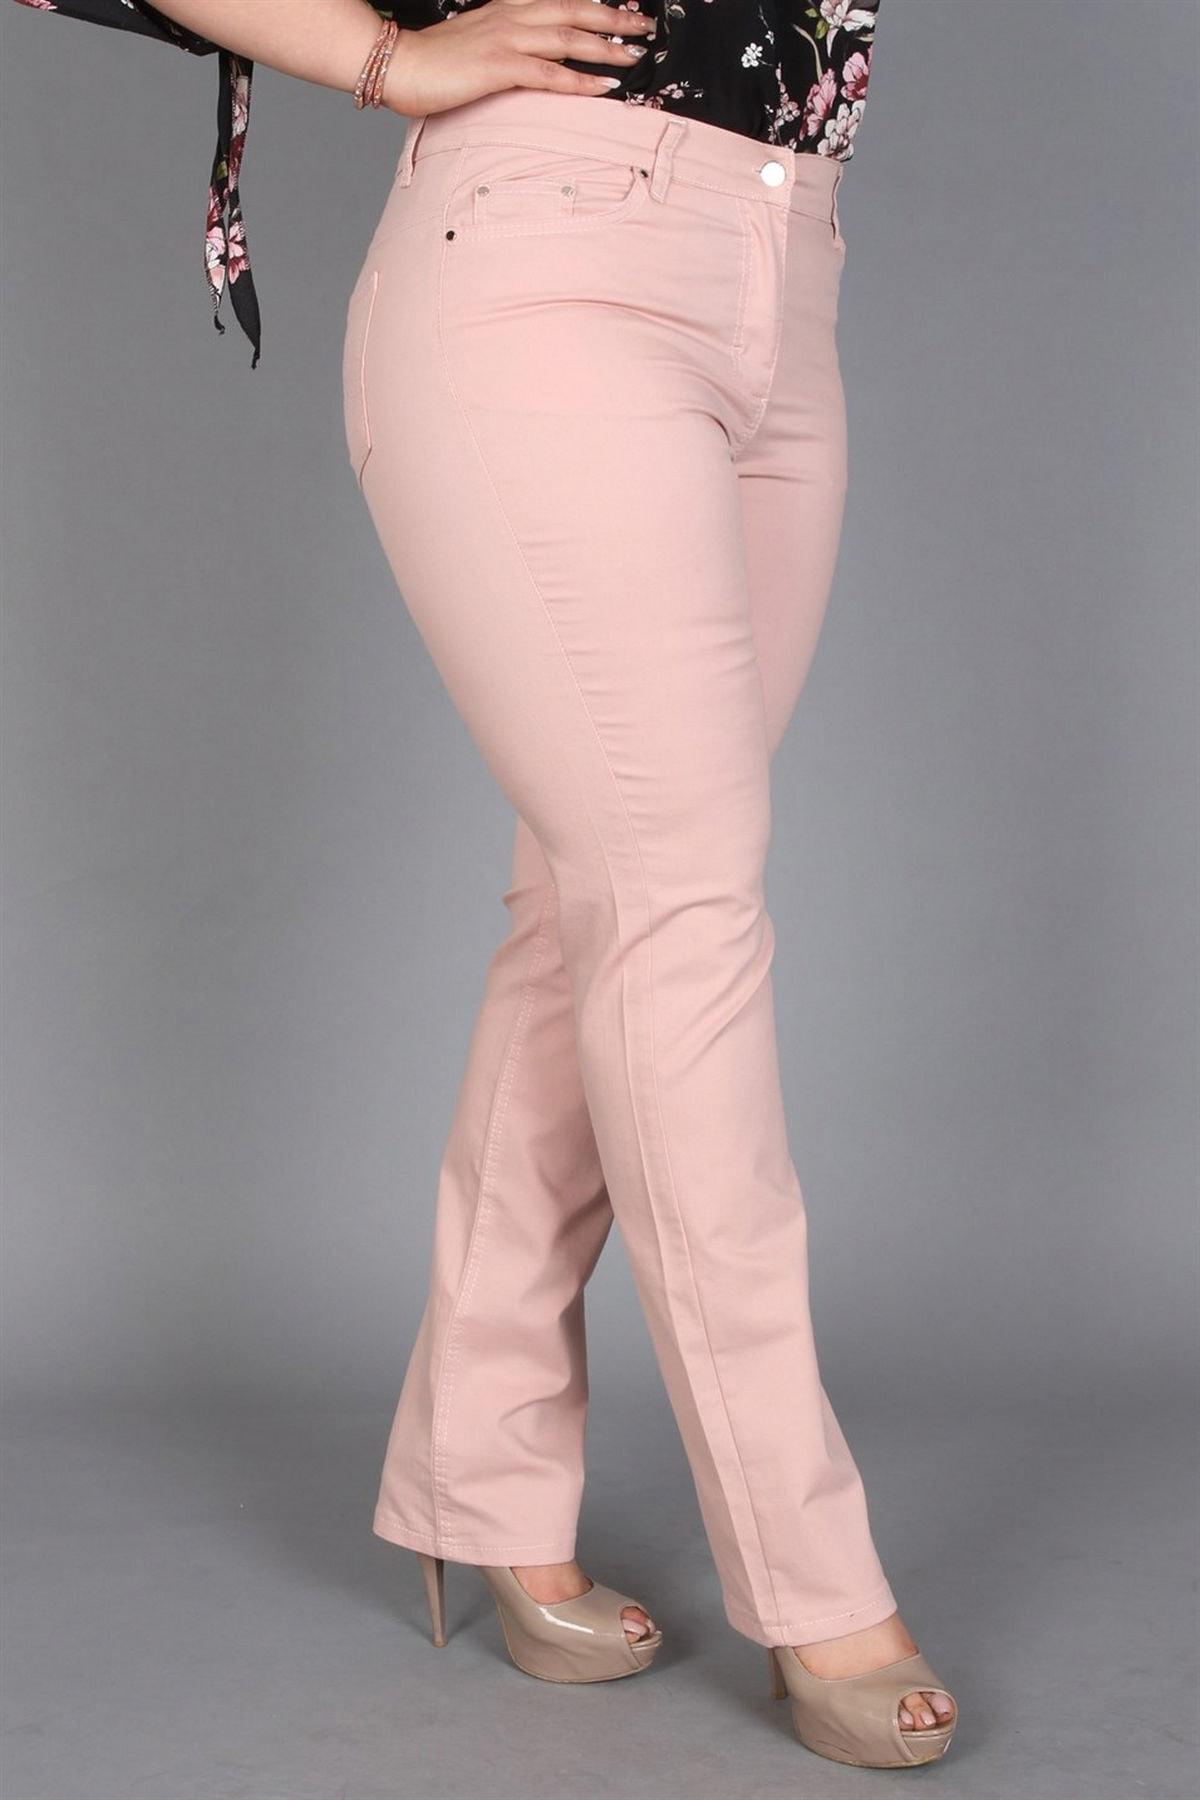 Günay Giyim Kadın Pudra Kanvas Yüksek Bel Düz Paça Pantolon Rg1029p 2